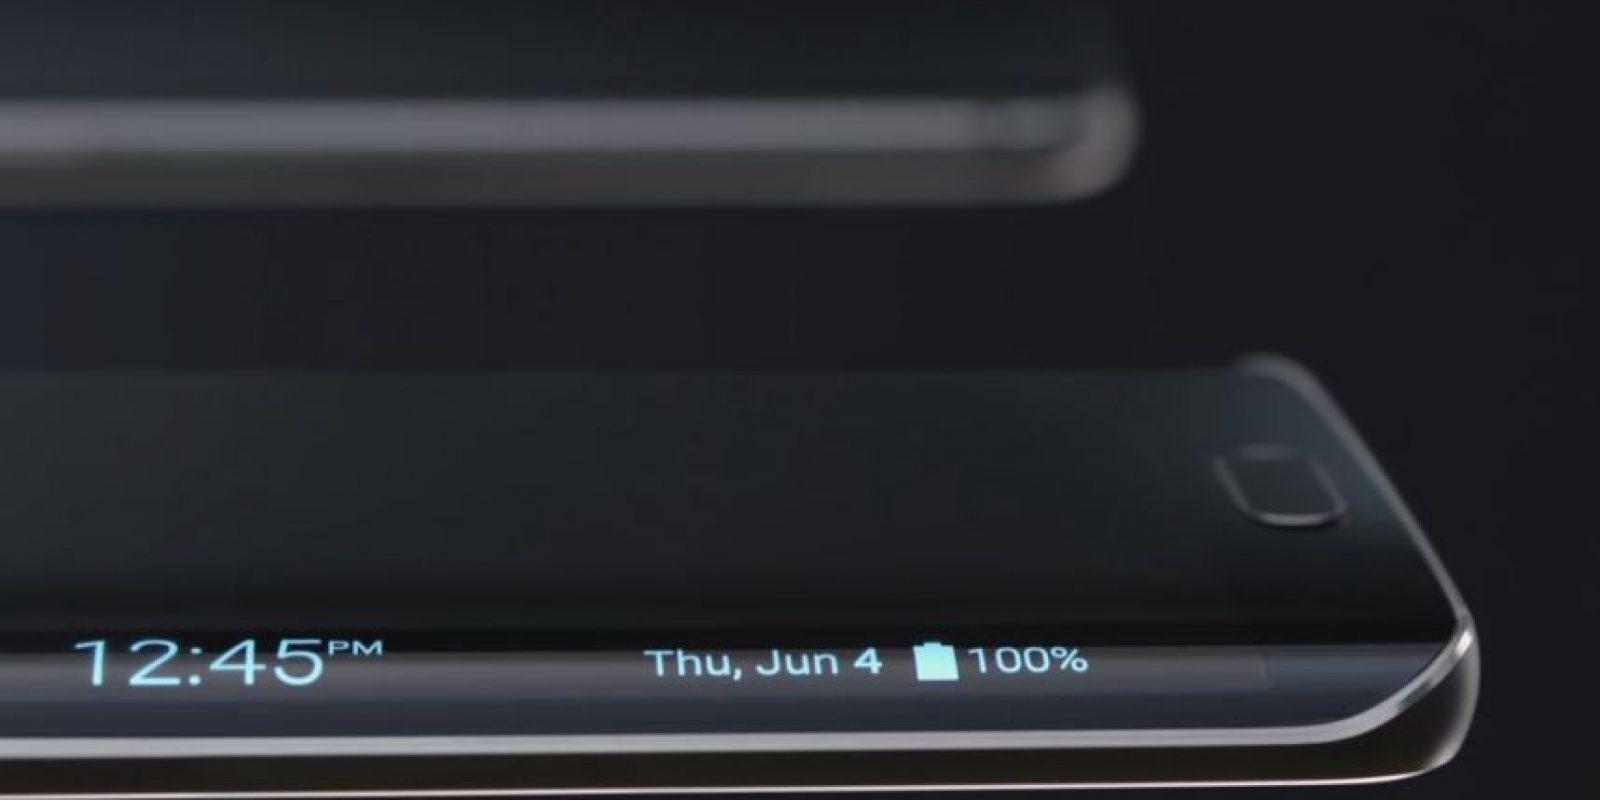 La doble curvatura del S6 Edge tiene muchas funciones. Foto:Samsung